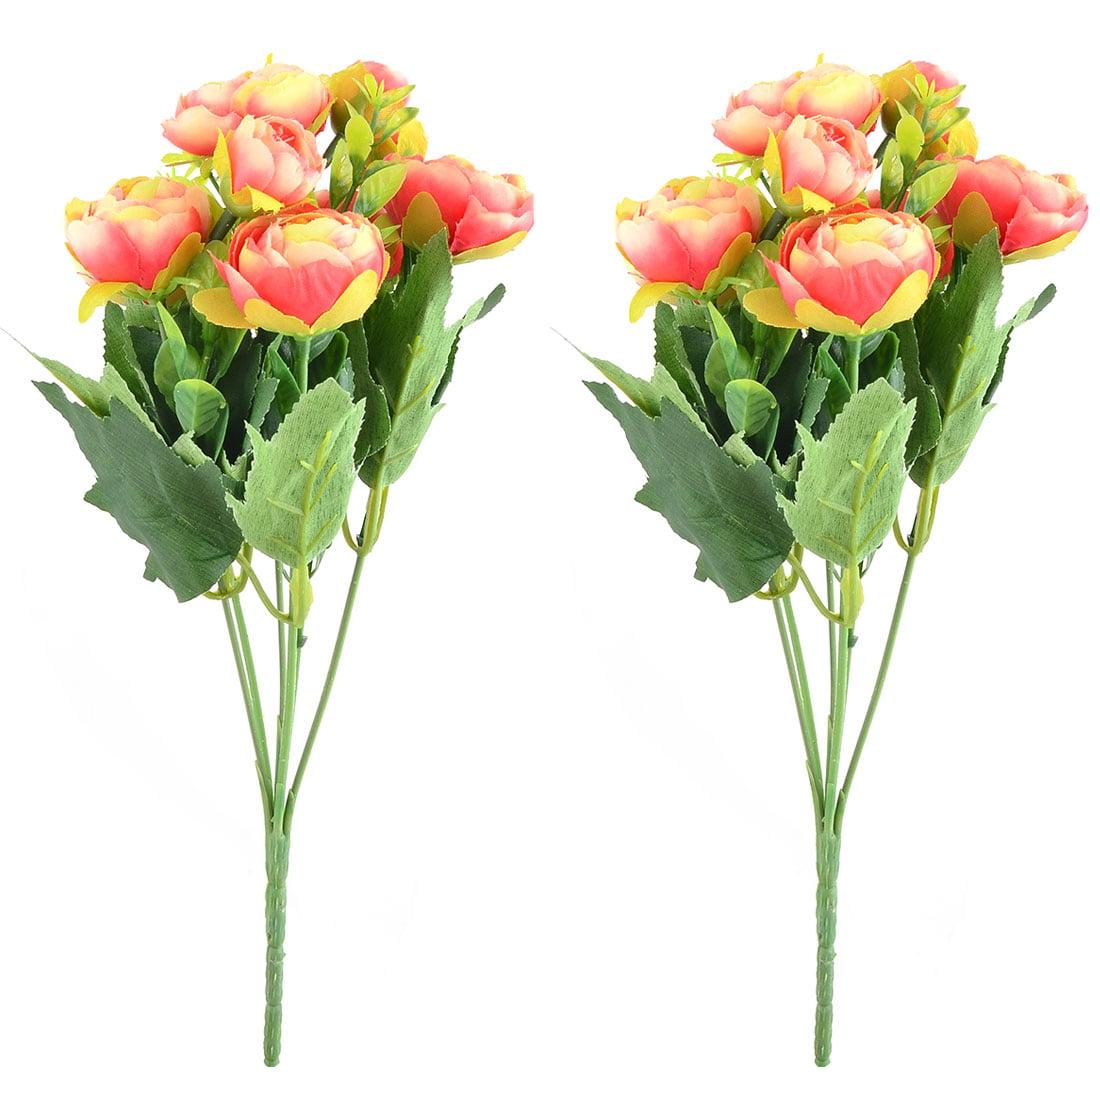 Fabric Camellia Shaped Craft Decor Artificial Flower Bouquet Hot Pink Beige 2pcs